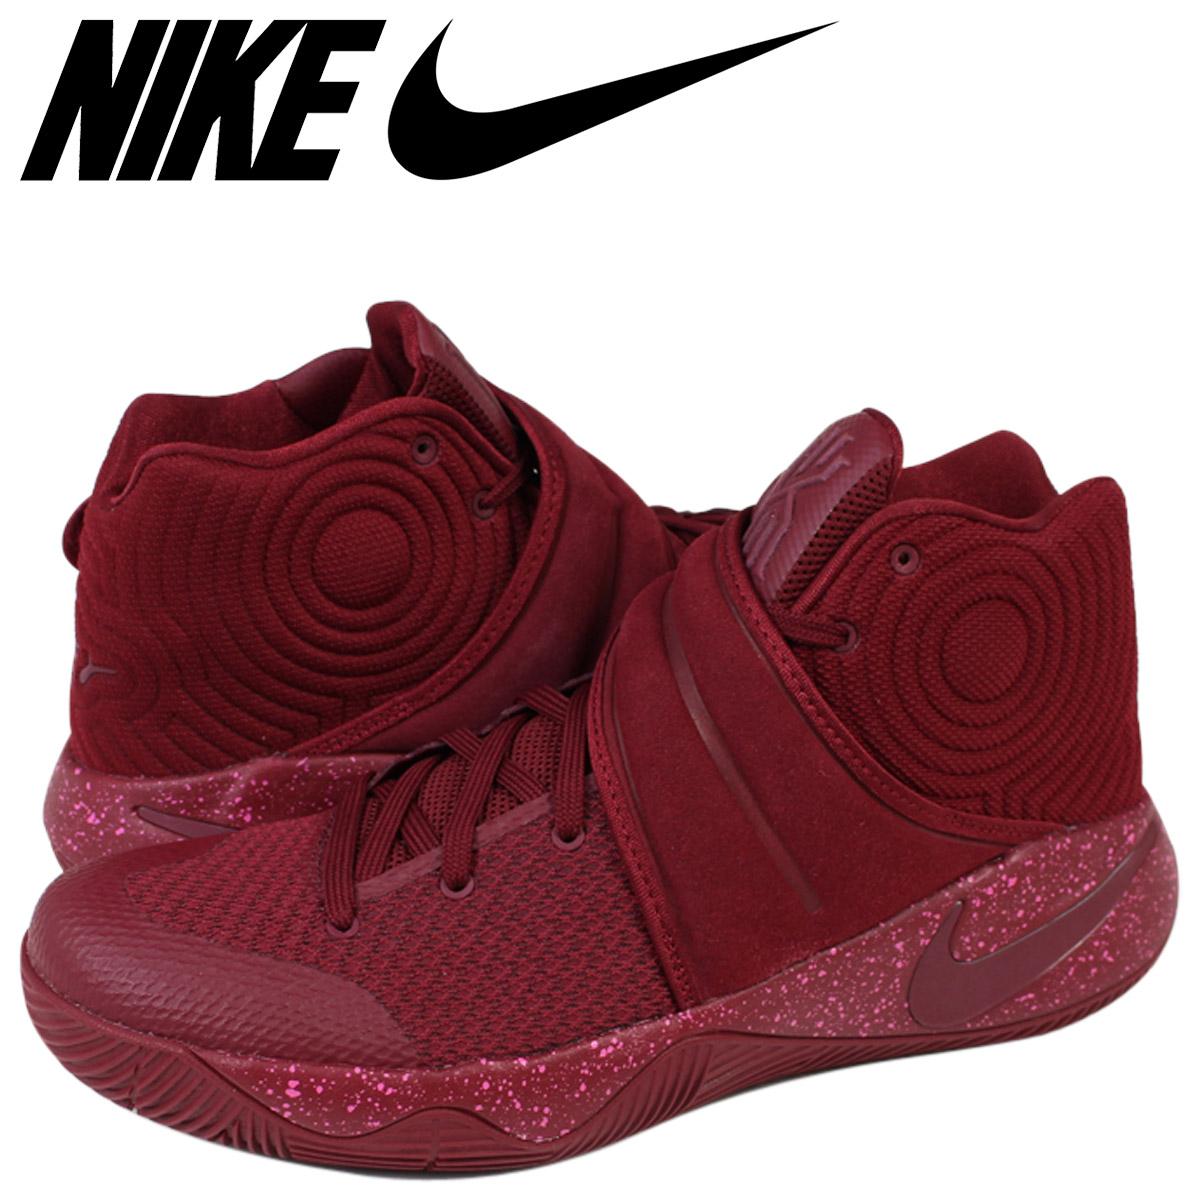 13744460260 ... wholesale nike chi lee nike sneakers kyrie 2 ep chi lee 2 820537 600  red men